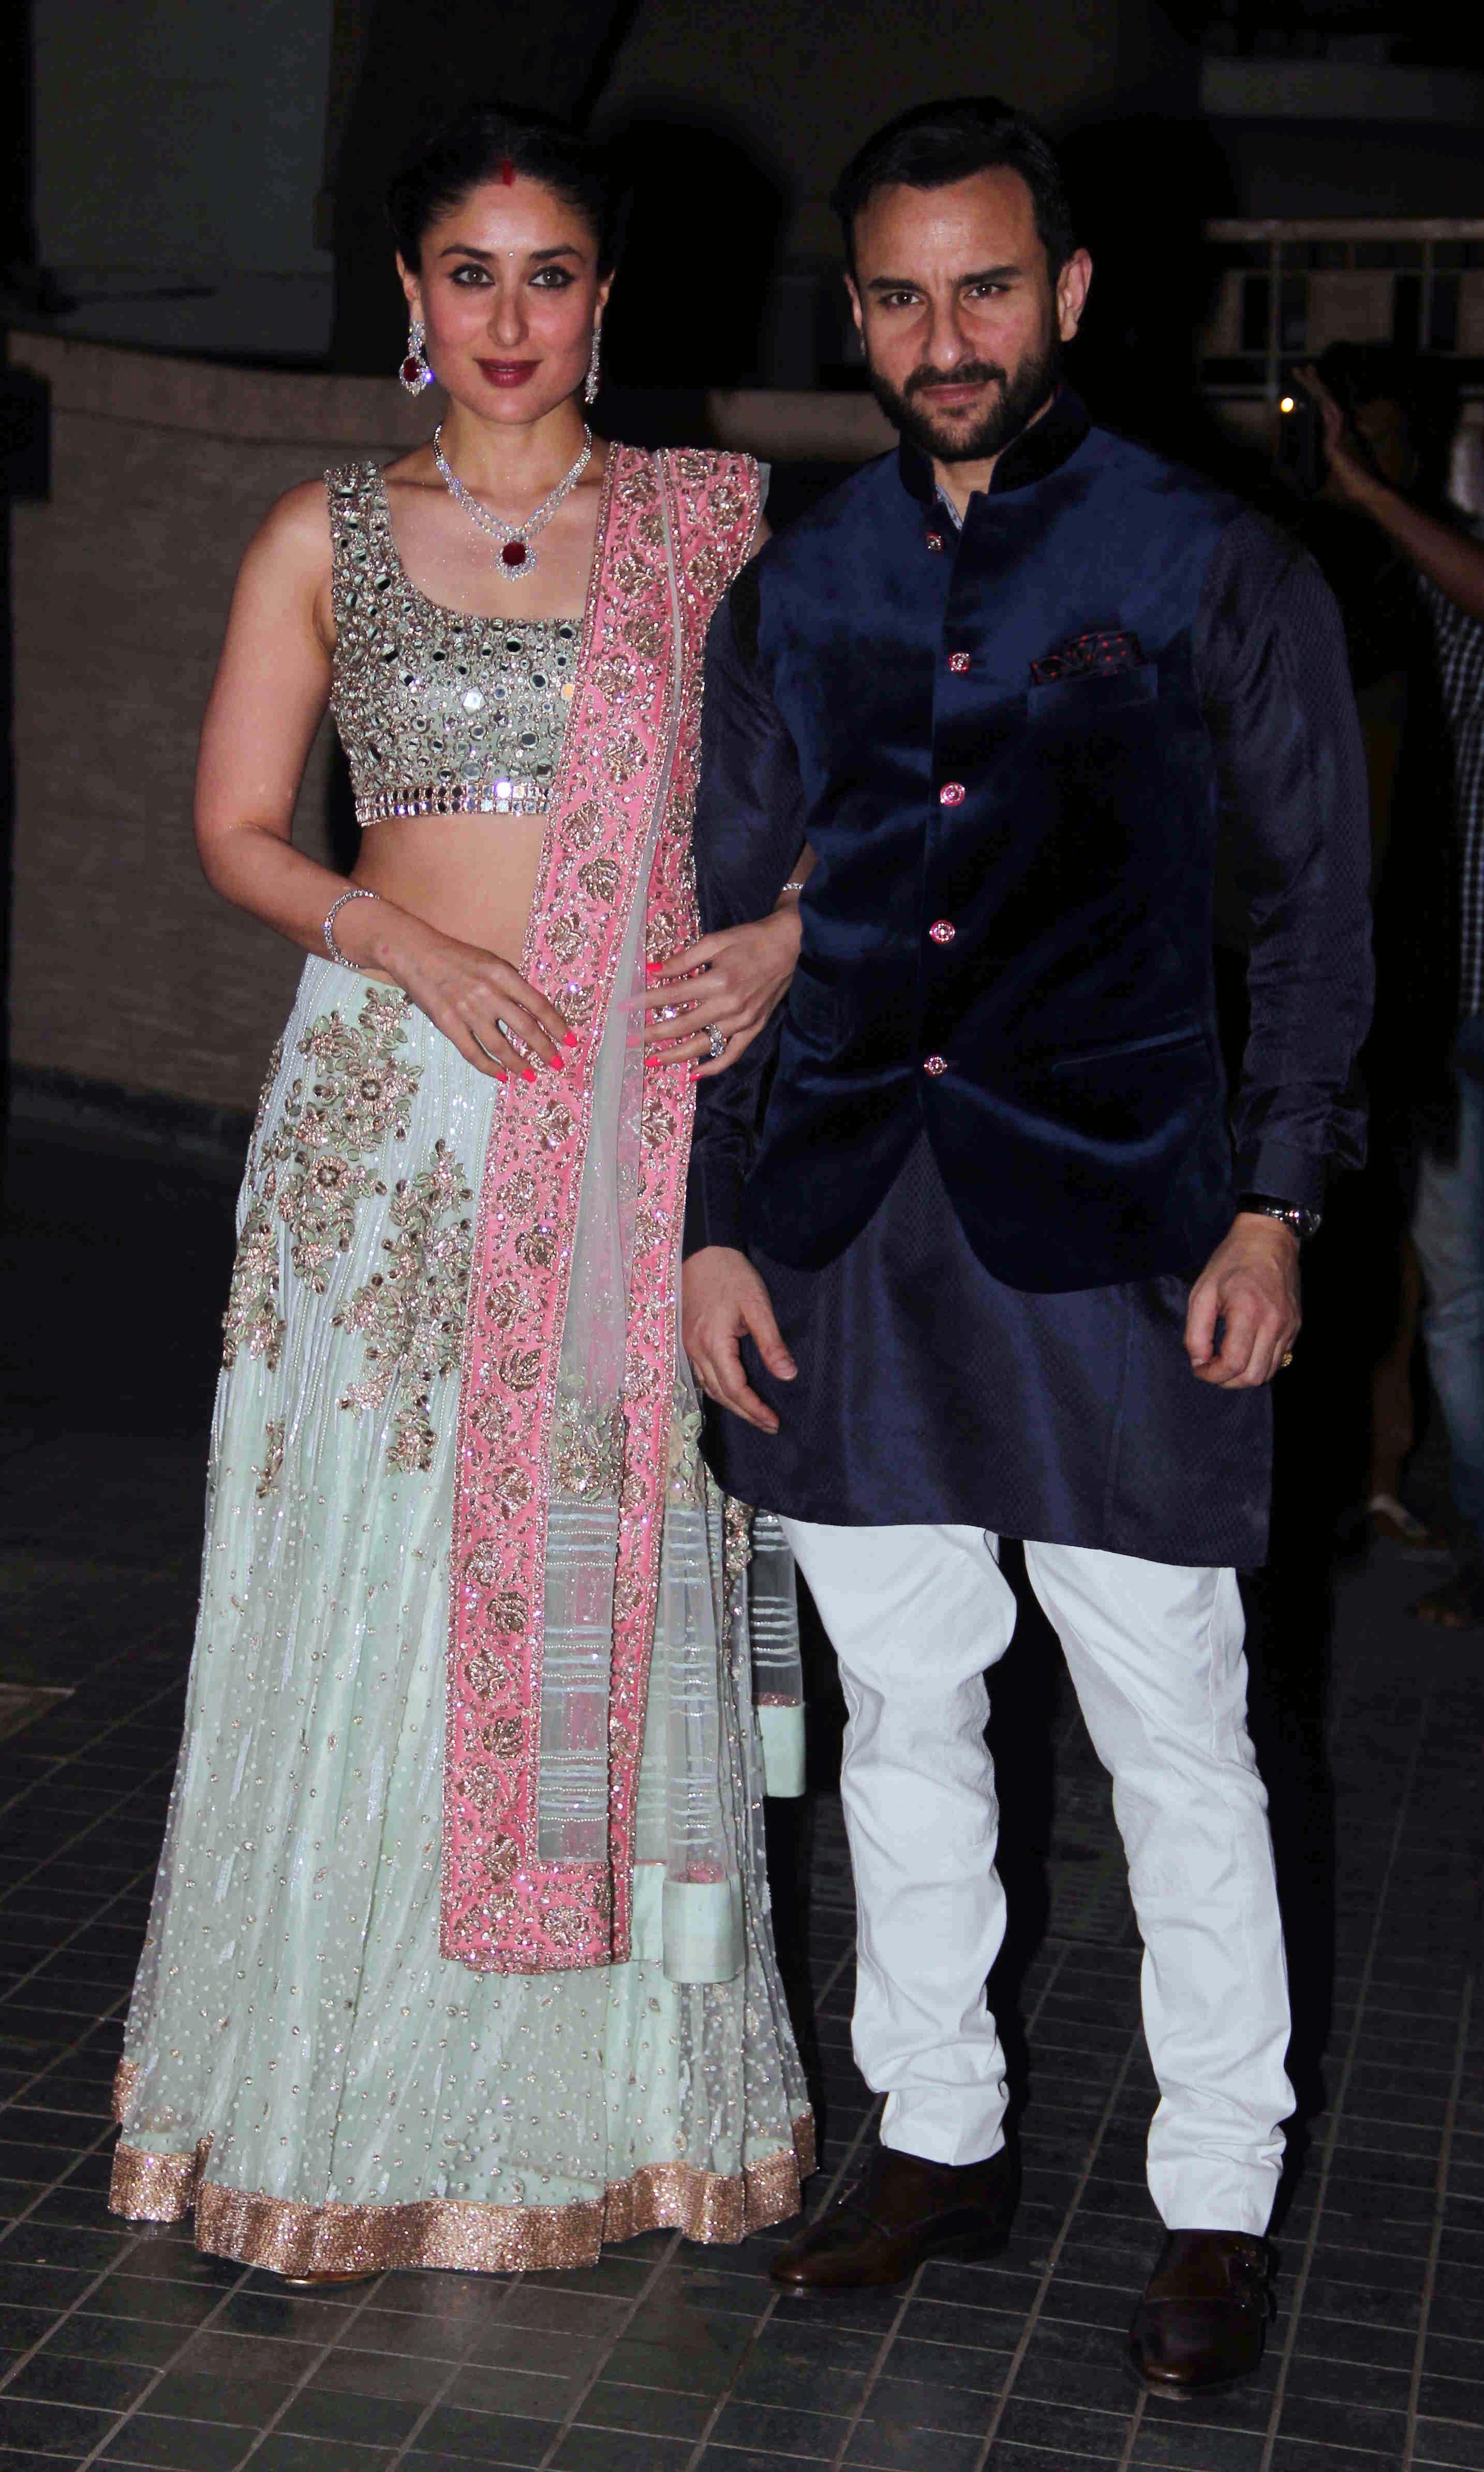 Kareena Kapoor With Saif Ali In Ghagra Choli